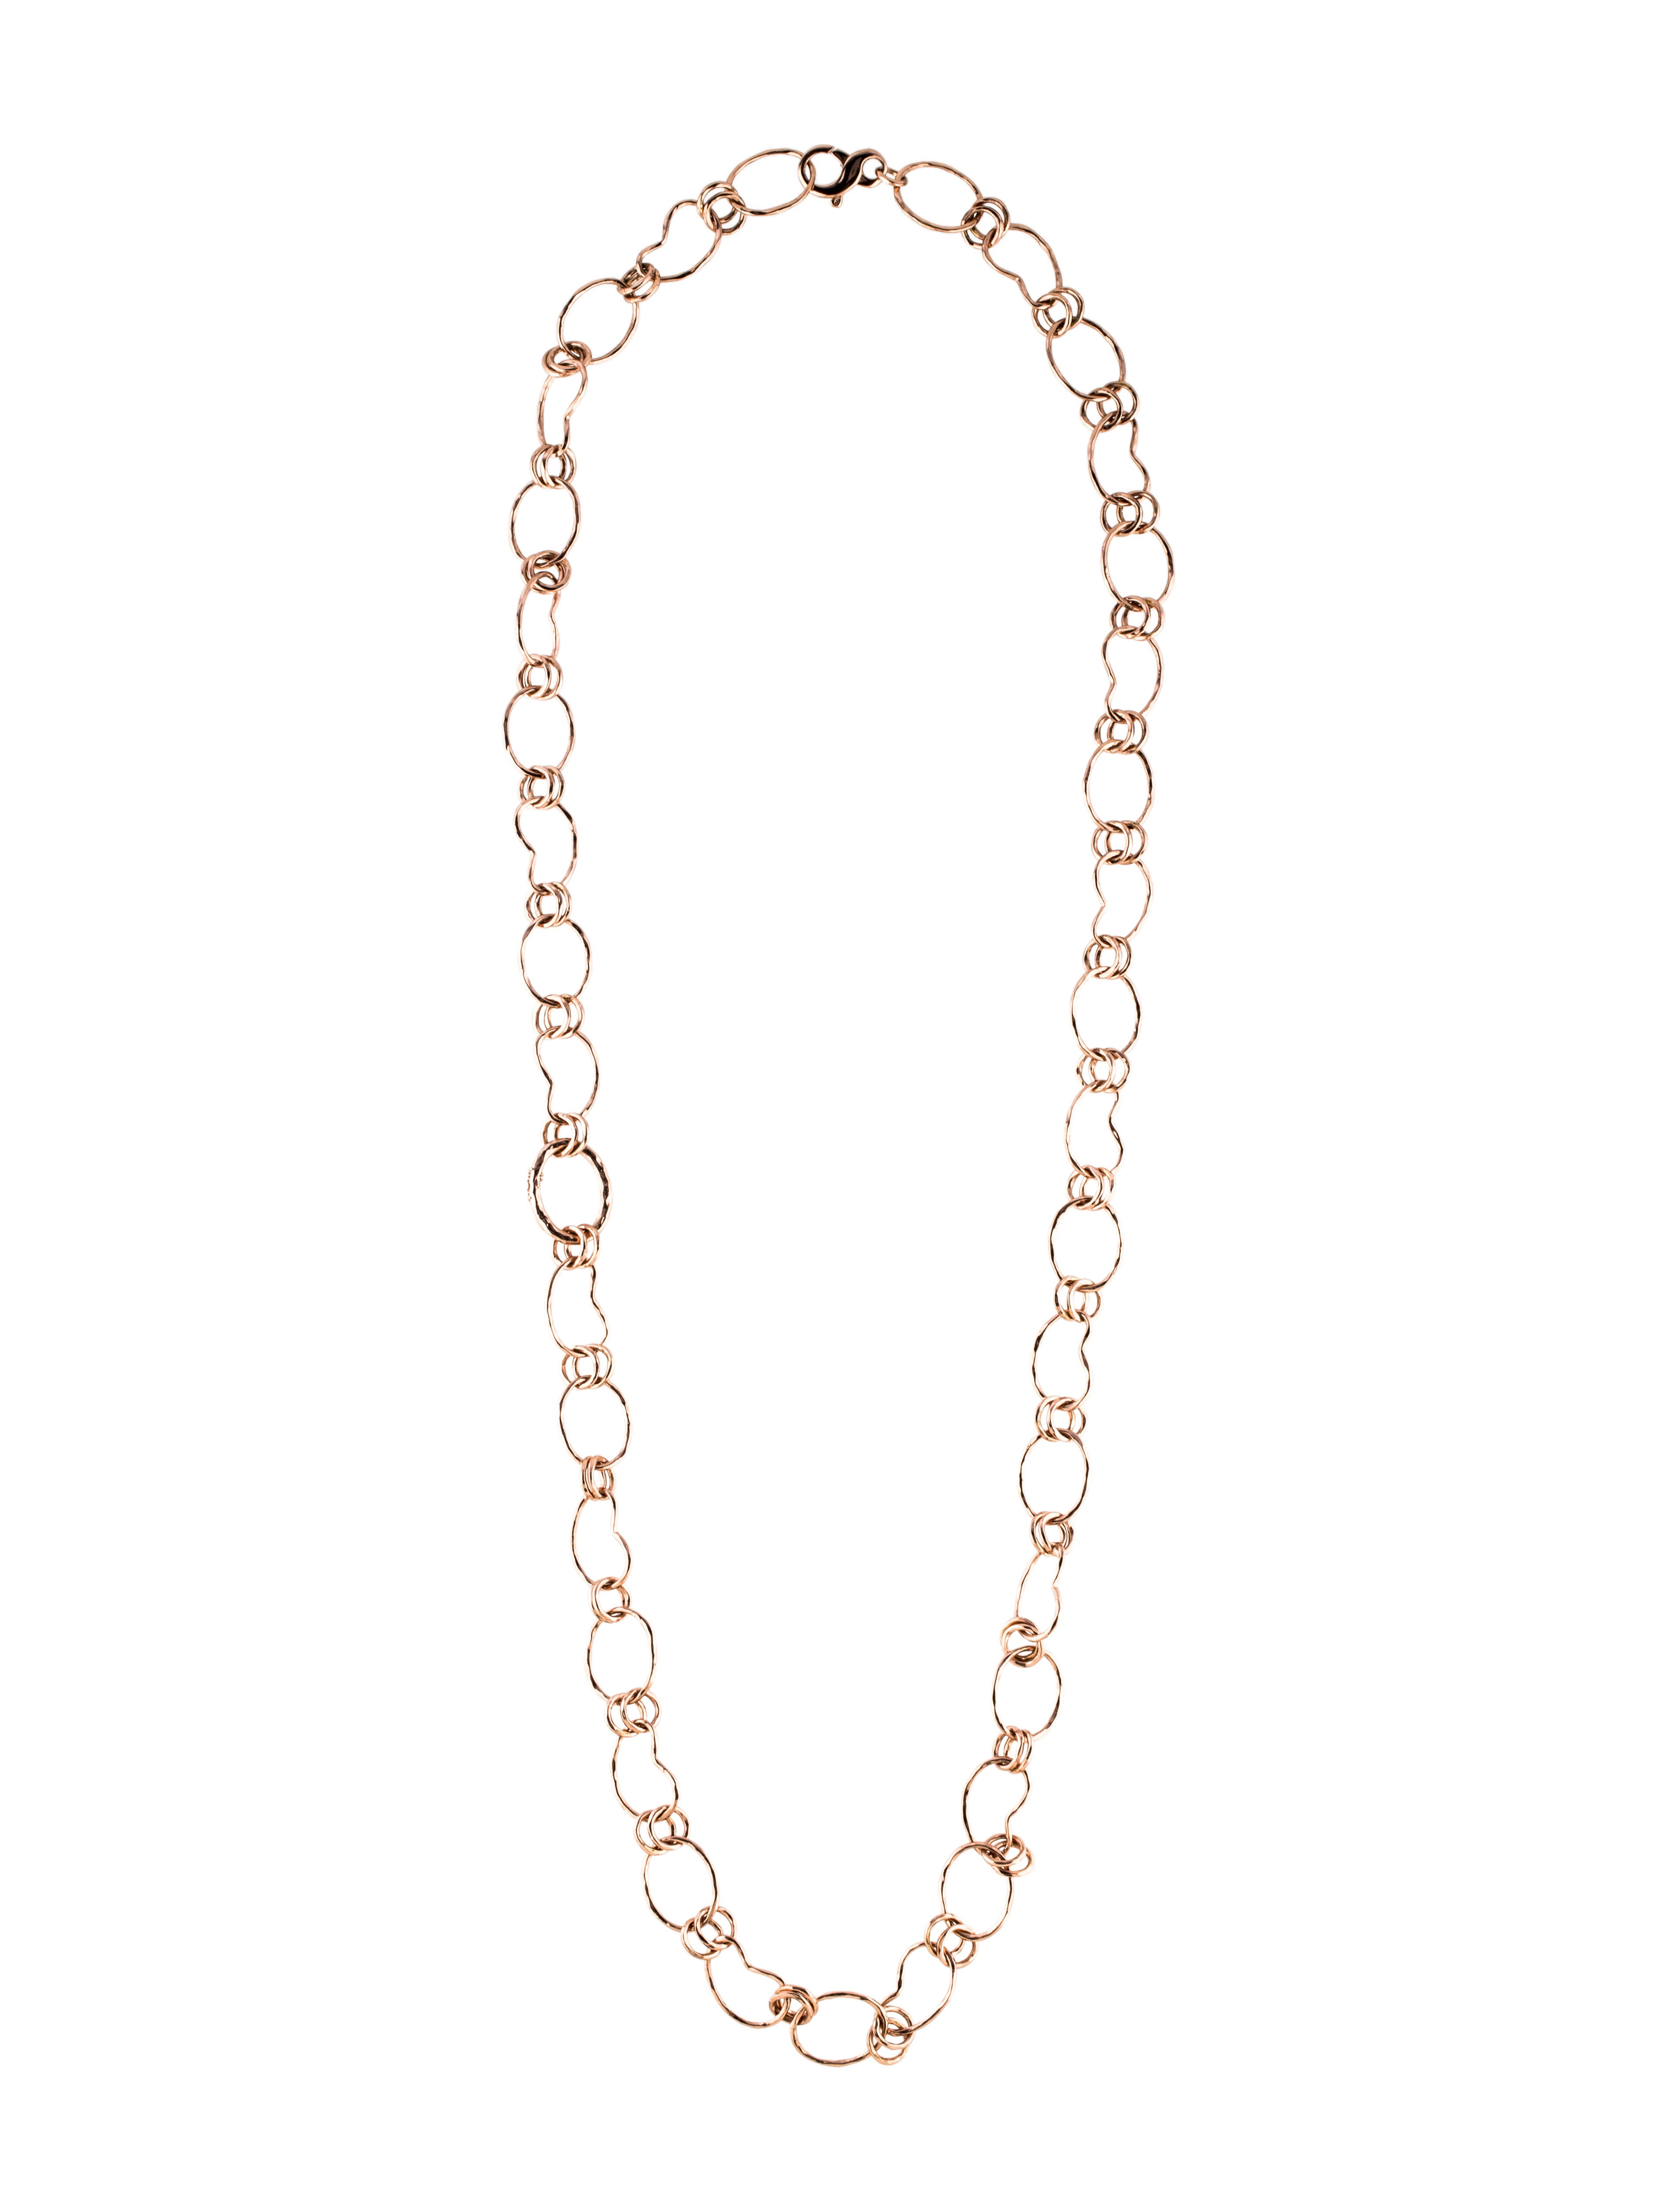 Ippolita 925 Classico Alternating Kidney Link Necklace WKbeW